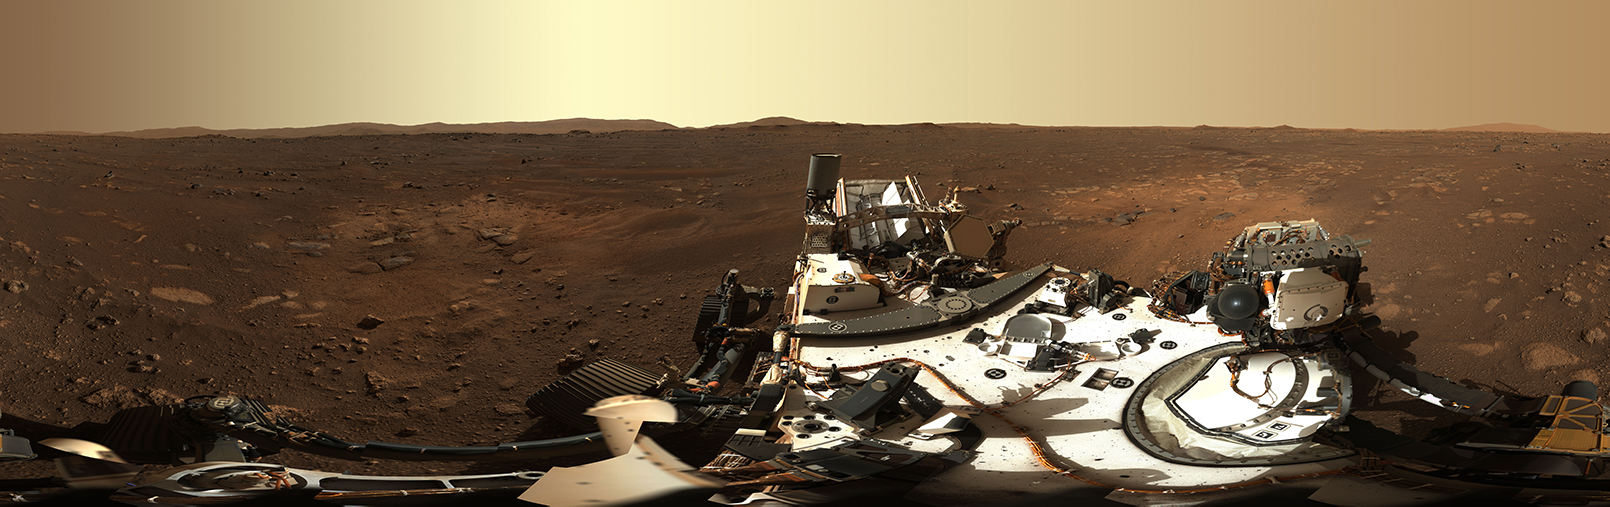 Mars 2020 Perseverance Rover - NASA Mars